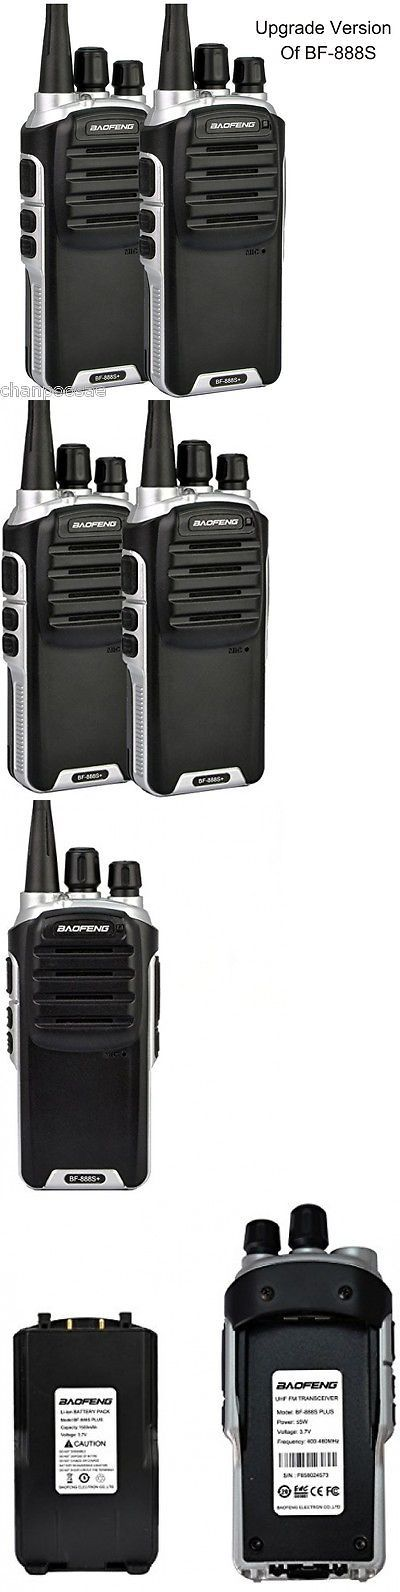 Walkie Talkies Two-Way Radios: Baofeng Bf-888S Plus Uhf Walkie Talkie Long Distance Range Communication Radios BUY IT NOW ONLY: $34.02